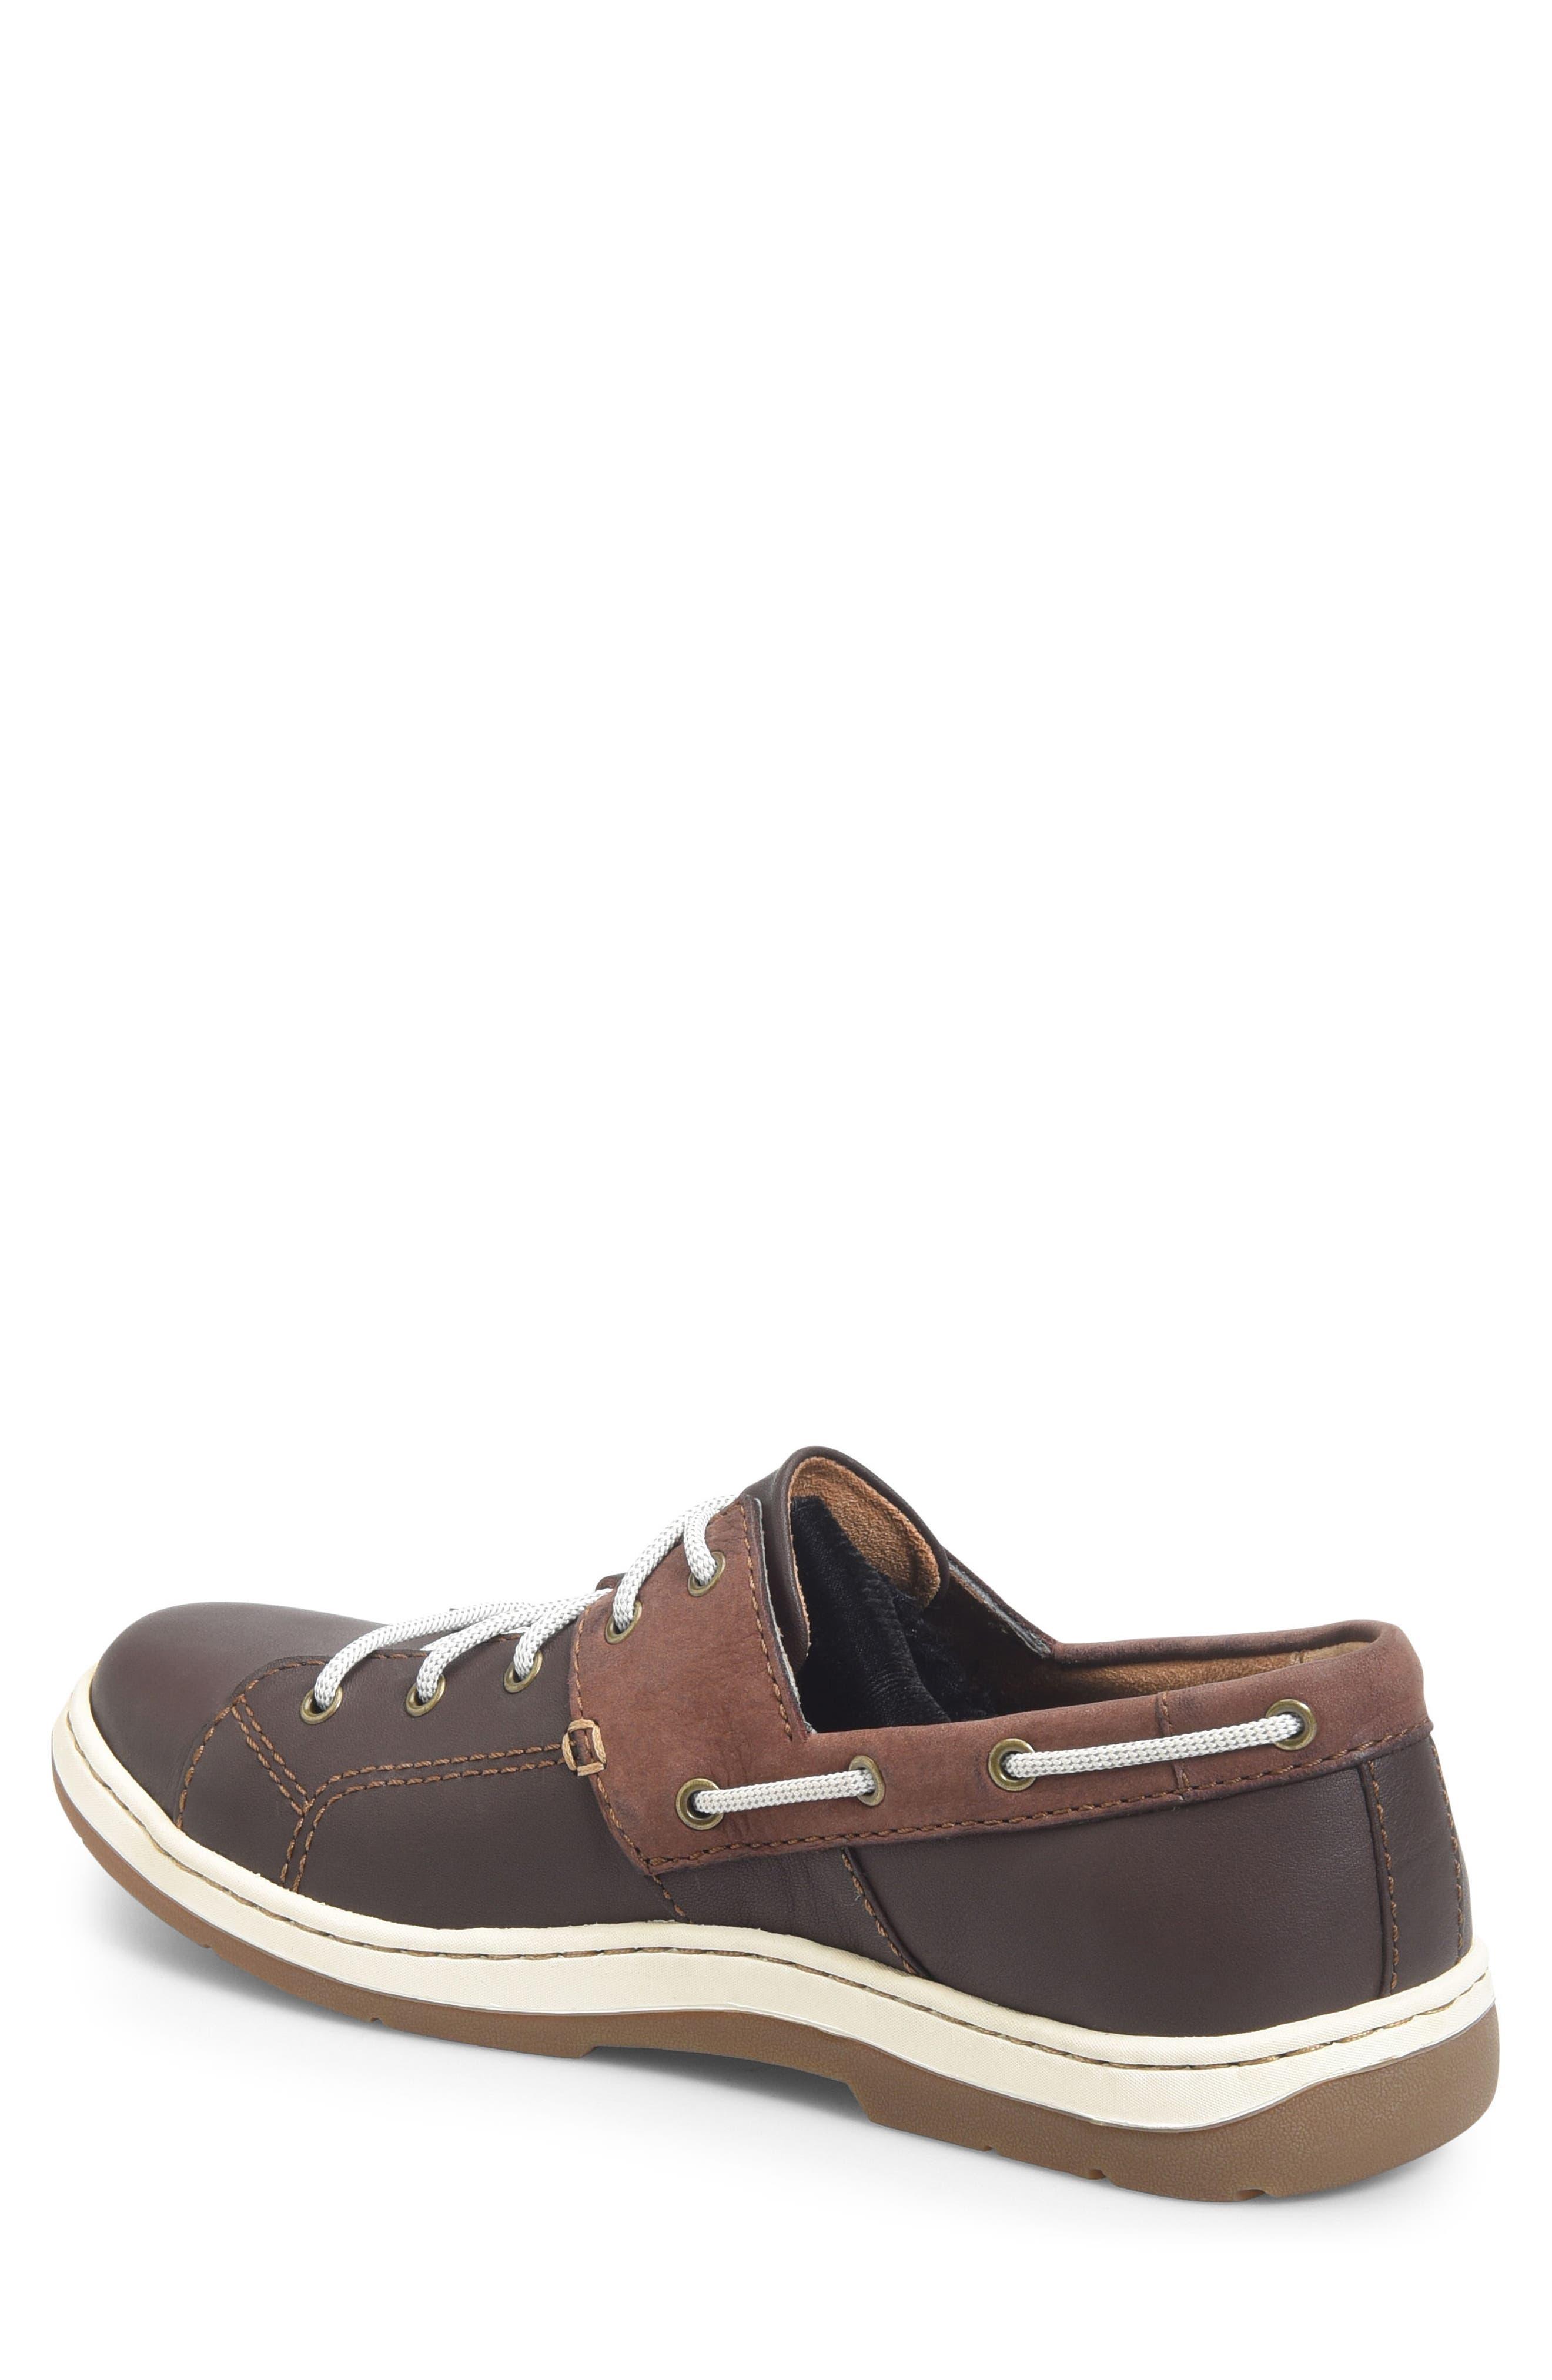 Marius Boat Shoe Sneaker,                             Alternate thumbnail 2, color,                             205